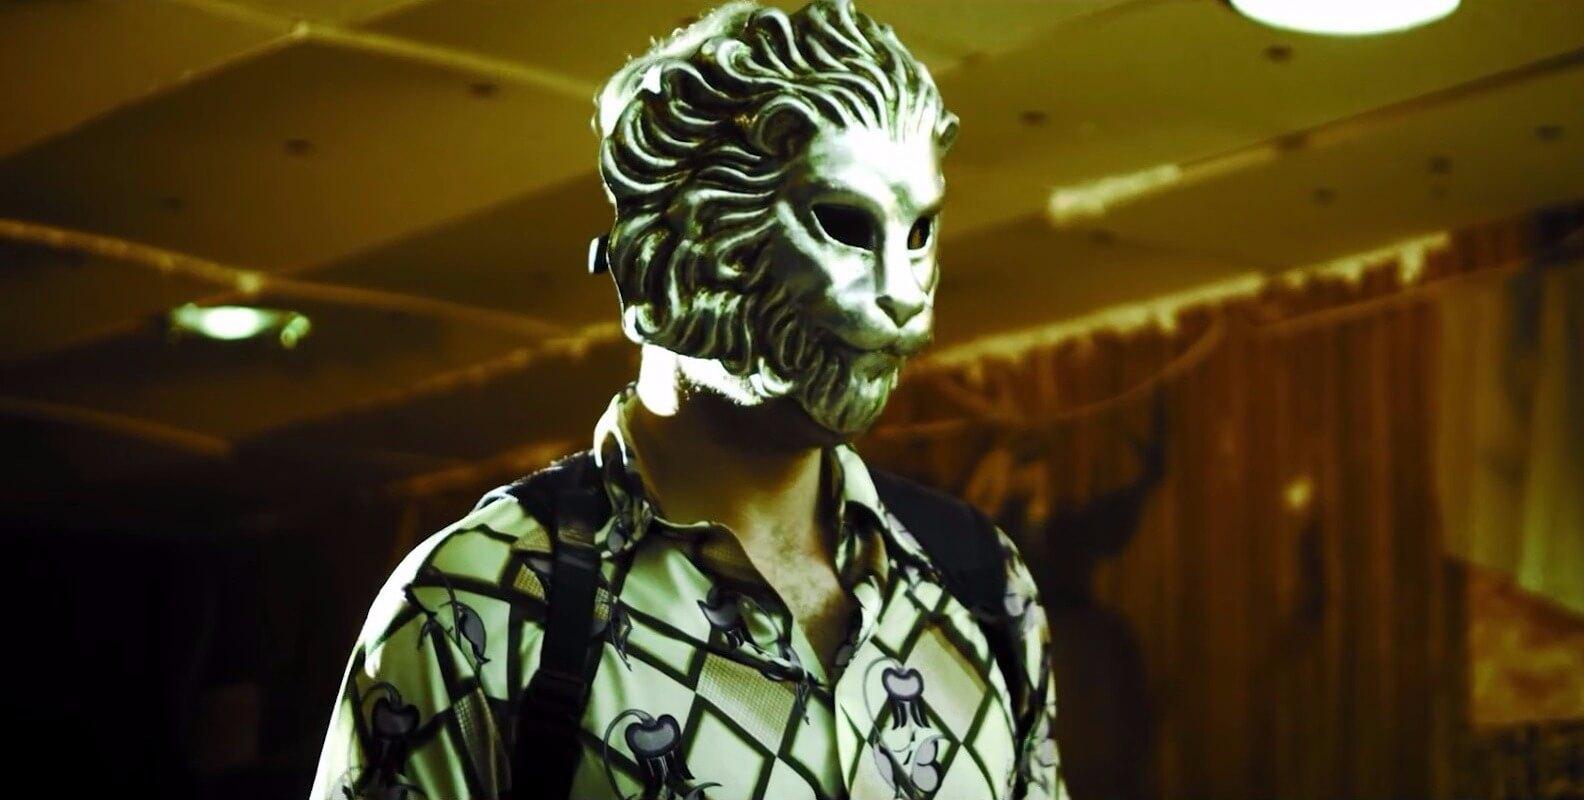 Union Furnace 2015 Spoiler Free Movie Review